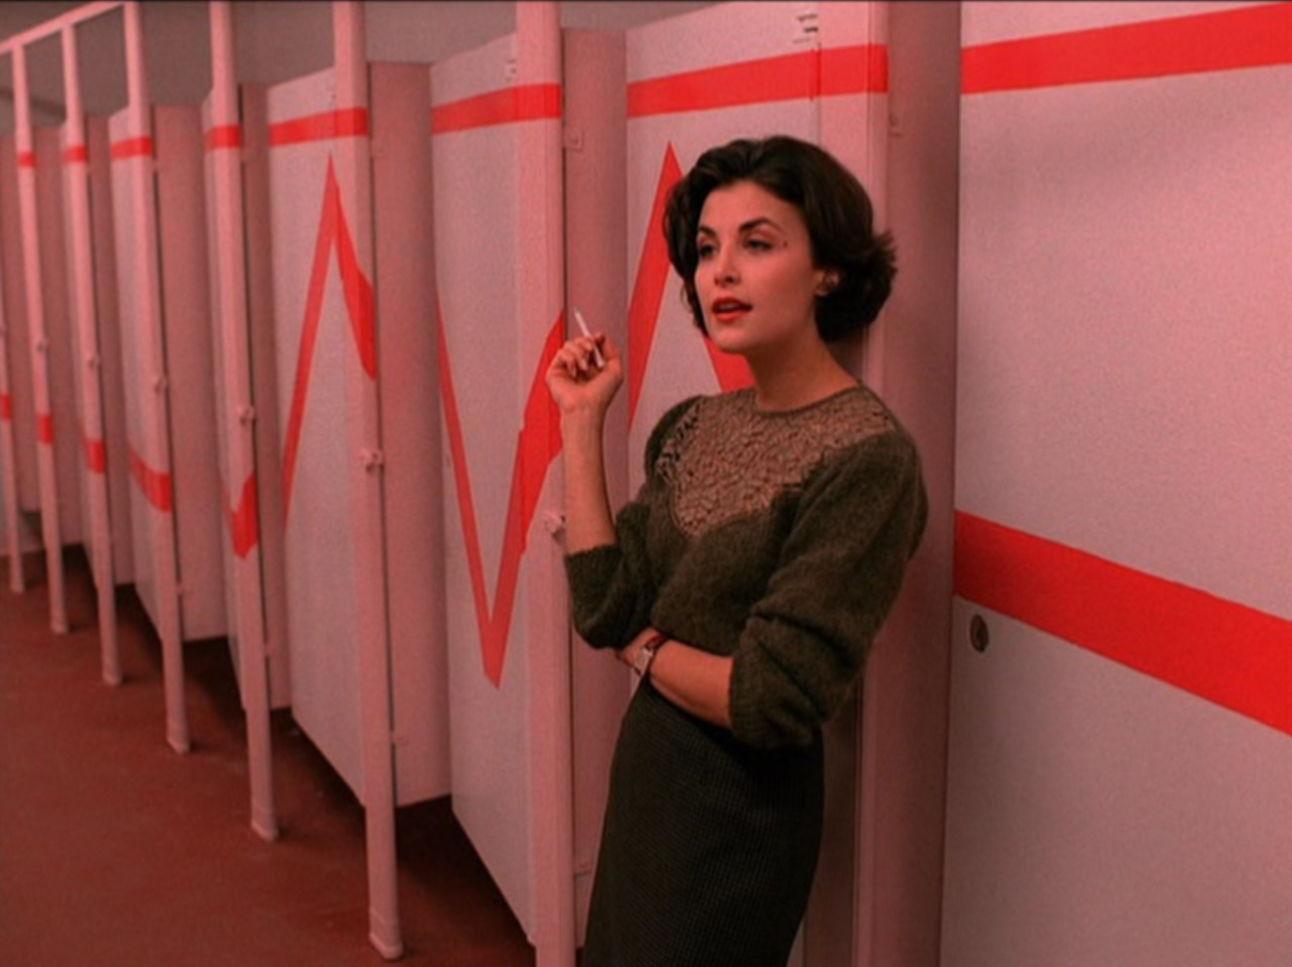 Twin Peaks Audrey 3.jpg